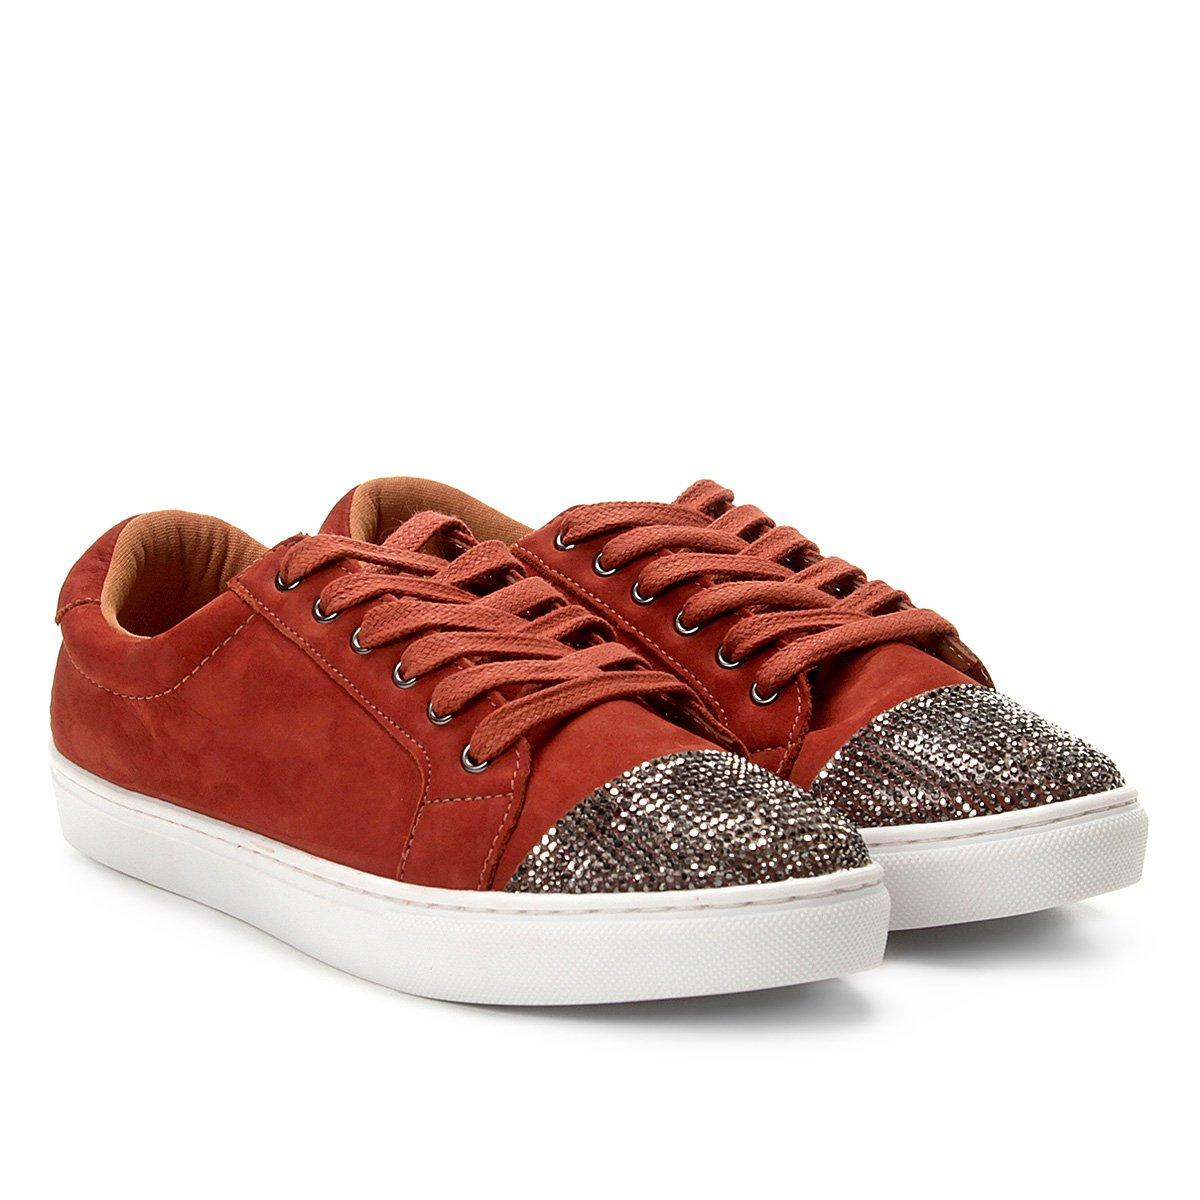 Tênis Shoestock Soft Crystal Nobuck Feminino - Caramelo